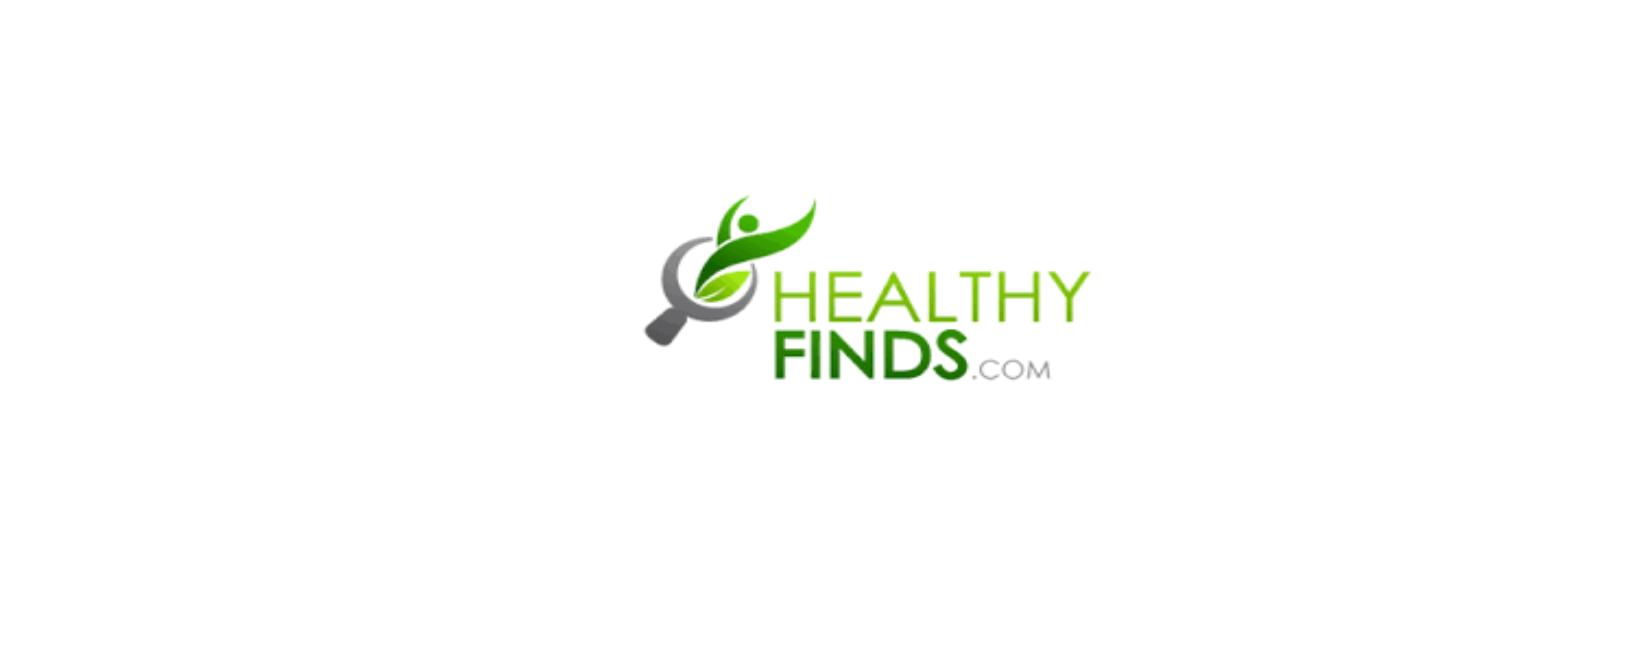 Healthy-Finds Discount Code 2021